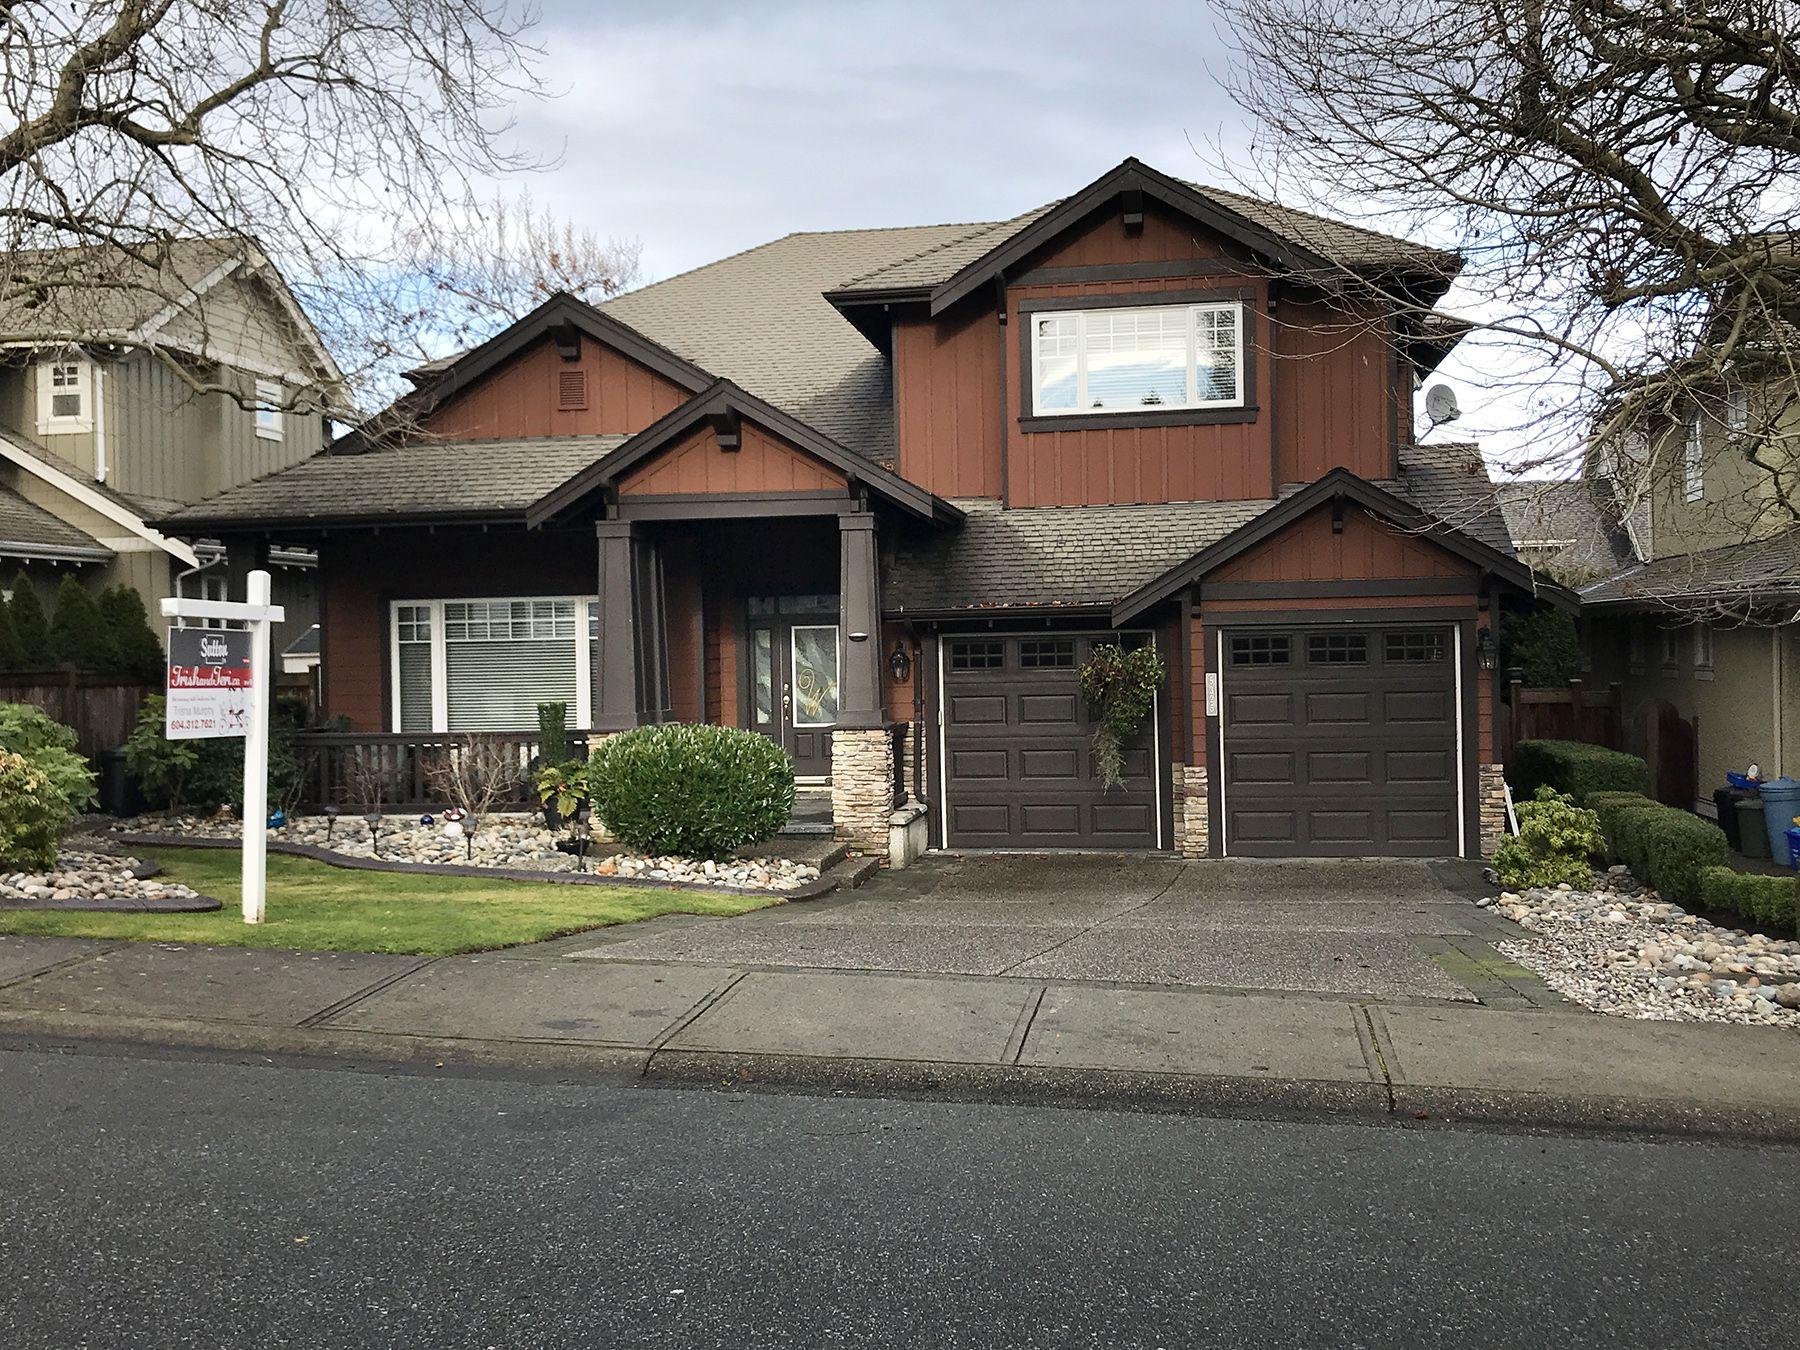 "Main Photo: 5325 6 Avenue in Delta: Tsawwassen Central House for sale in ""TSAWWASSEN CENTRAL"" (Tsawwassen)  : MLS®# R2229828"